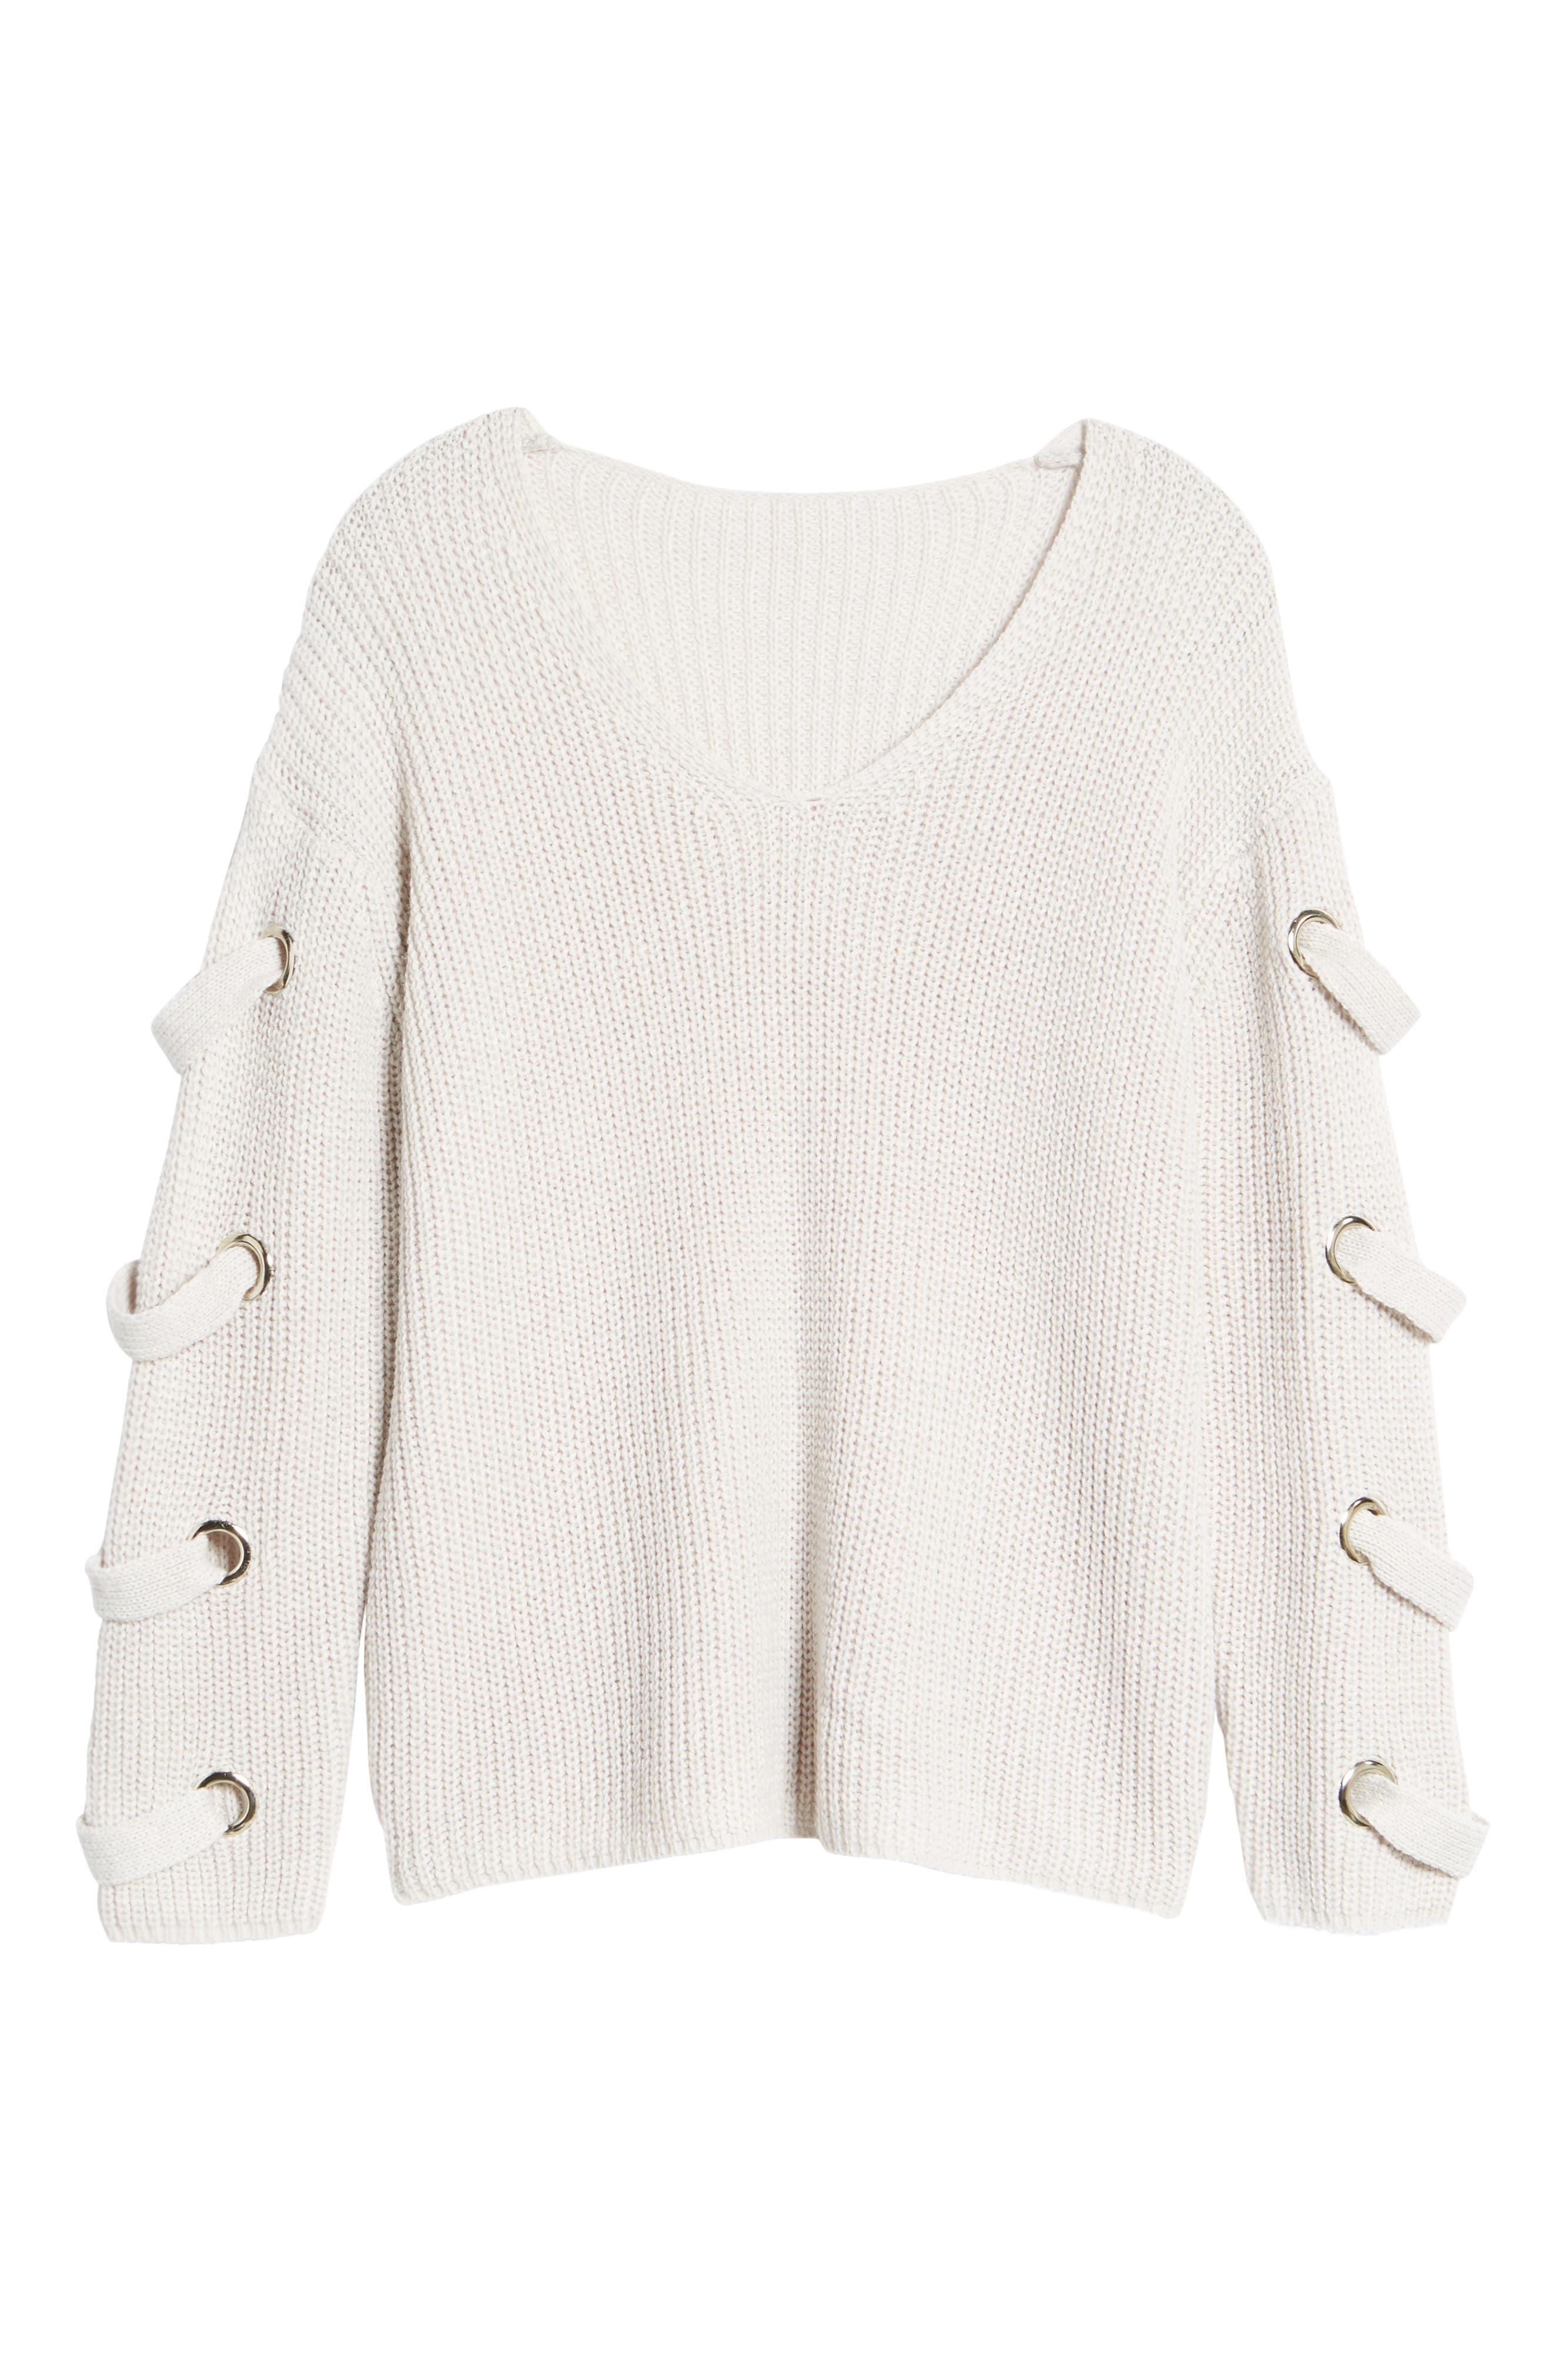 Grommet Sleeve Sweater,                             Alternate thumbnail 6, color,                             050